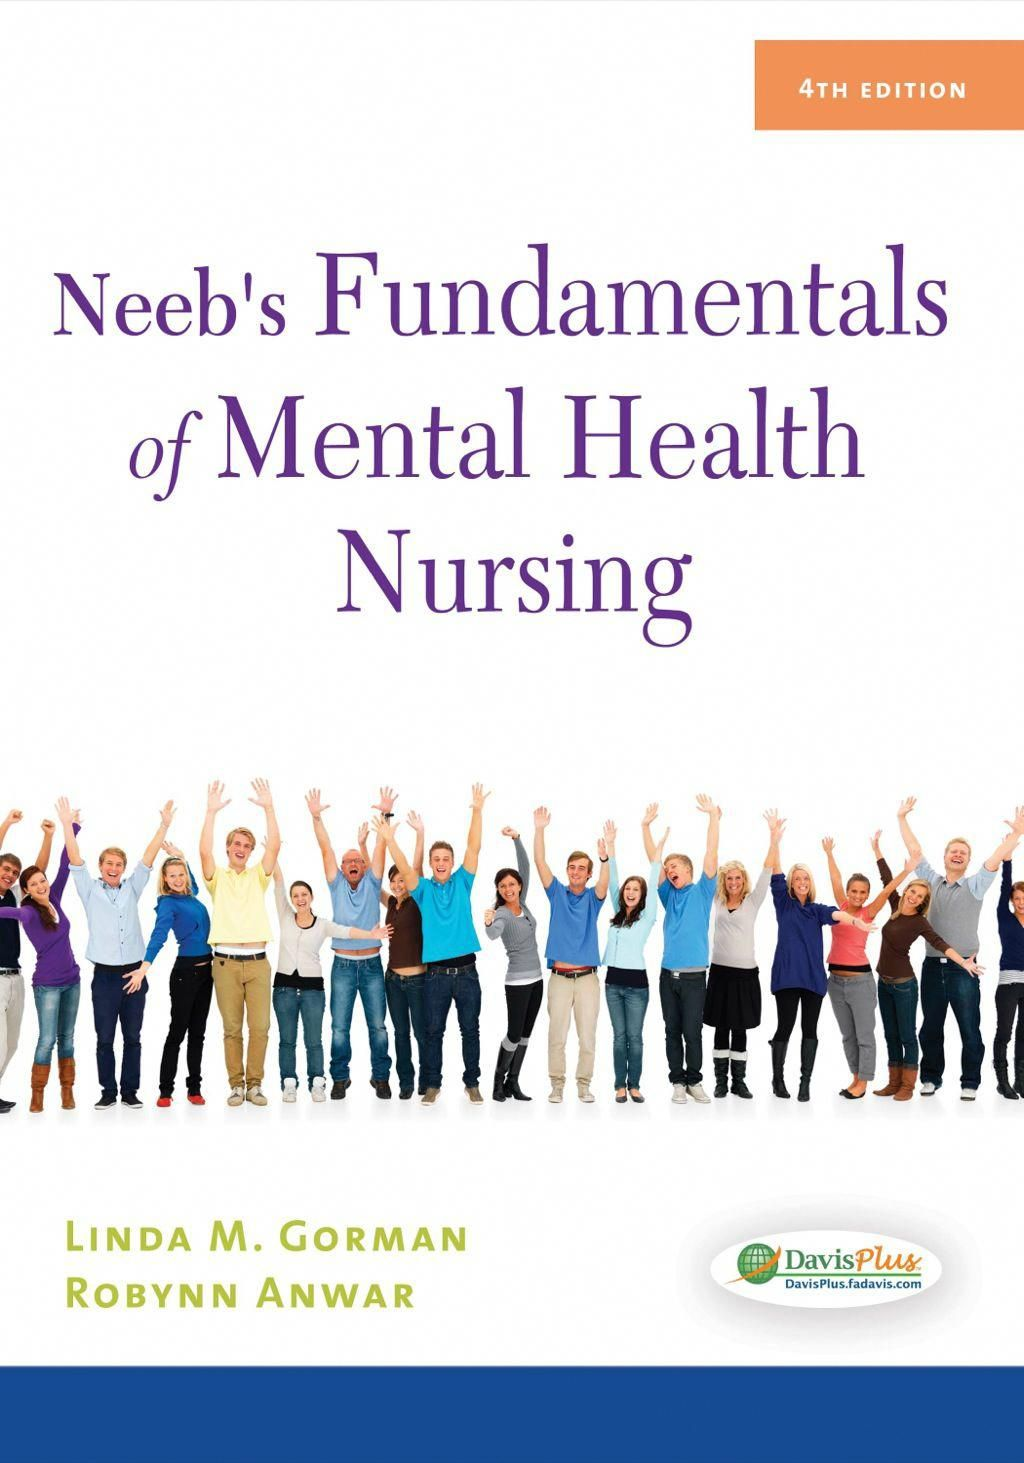 Pin on Getting Into Nursing Schools